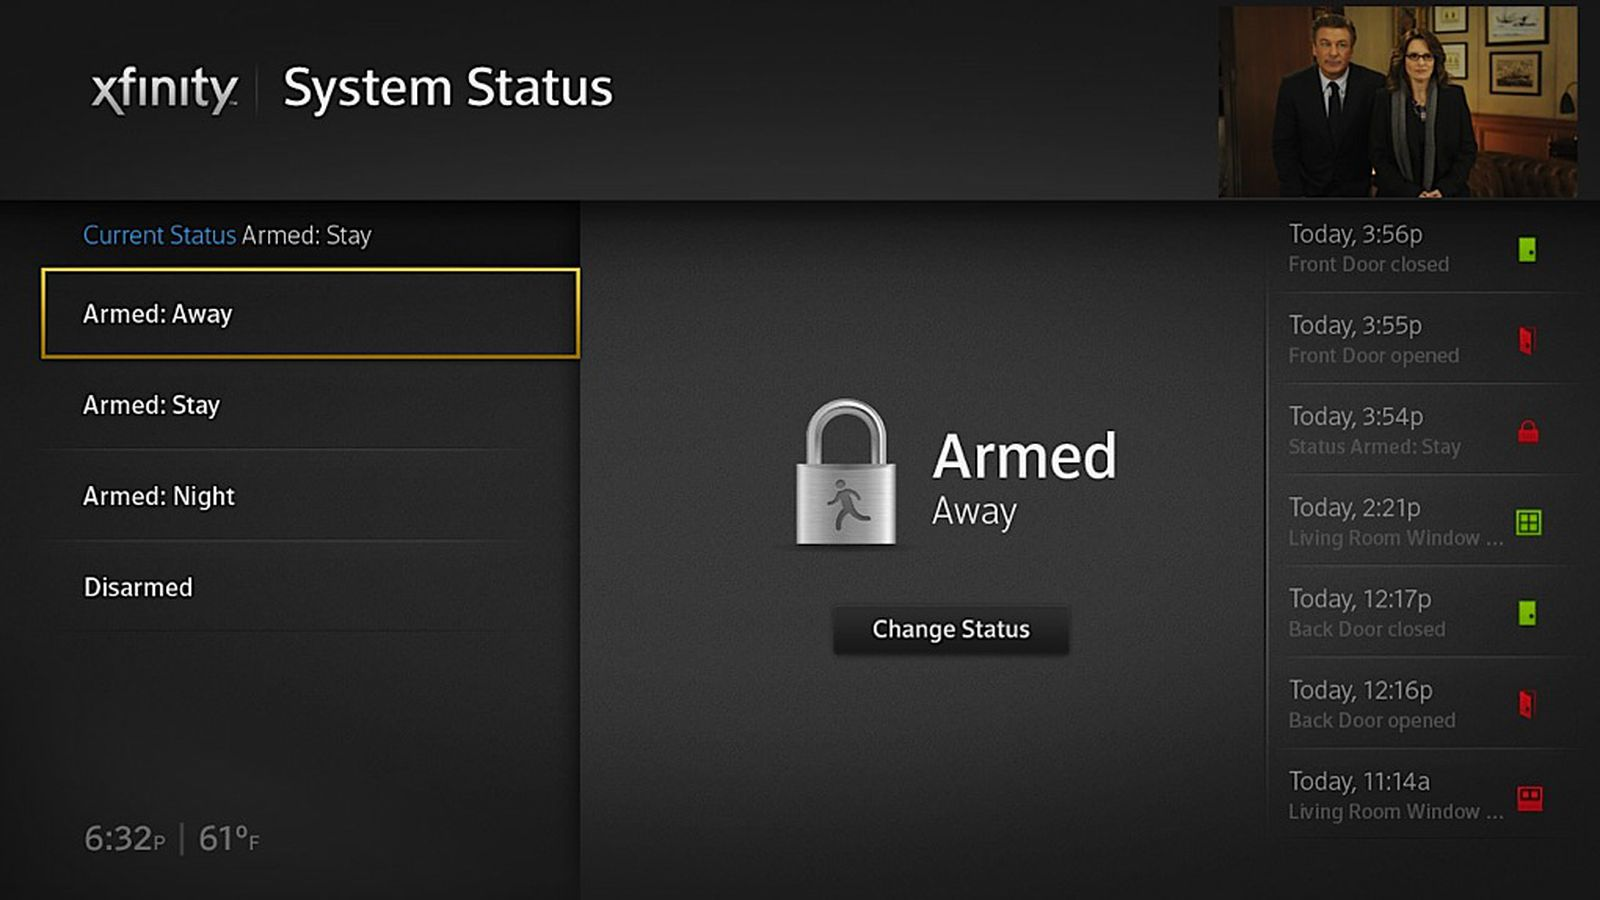 Xfinity Security Alarm System